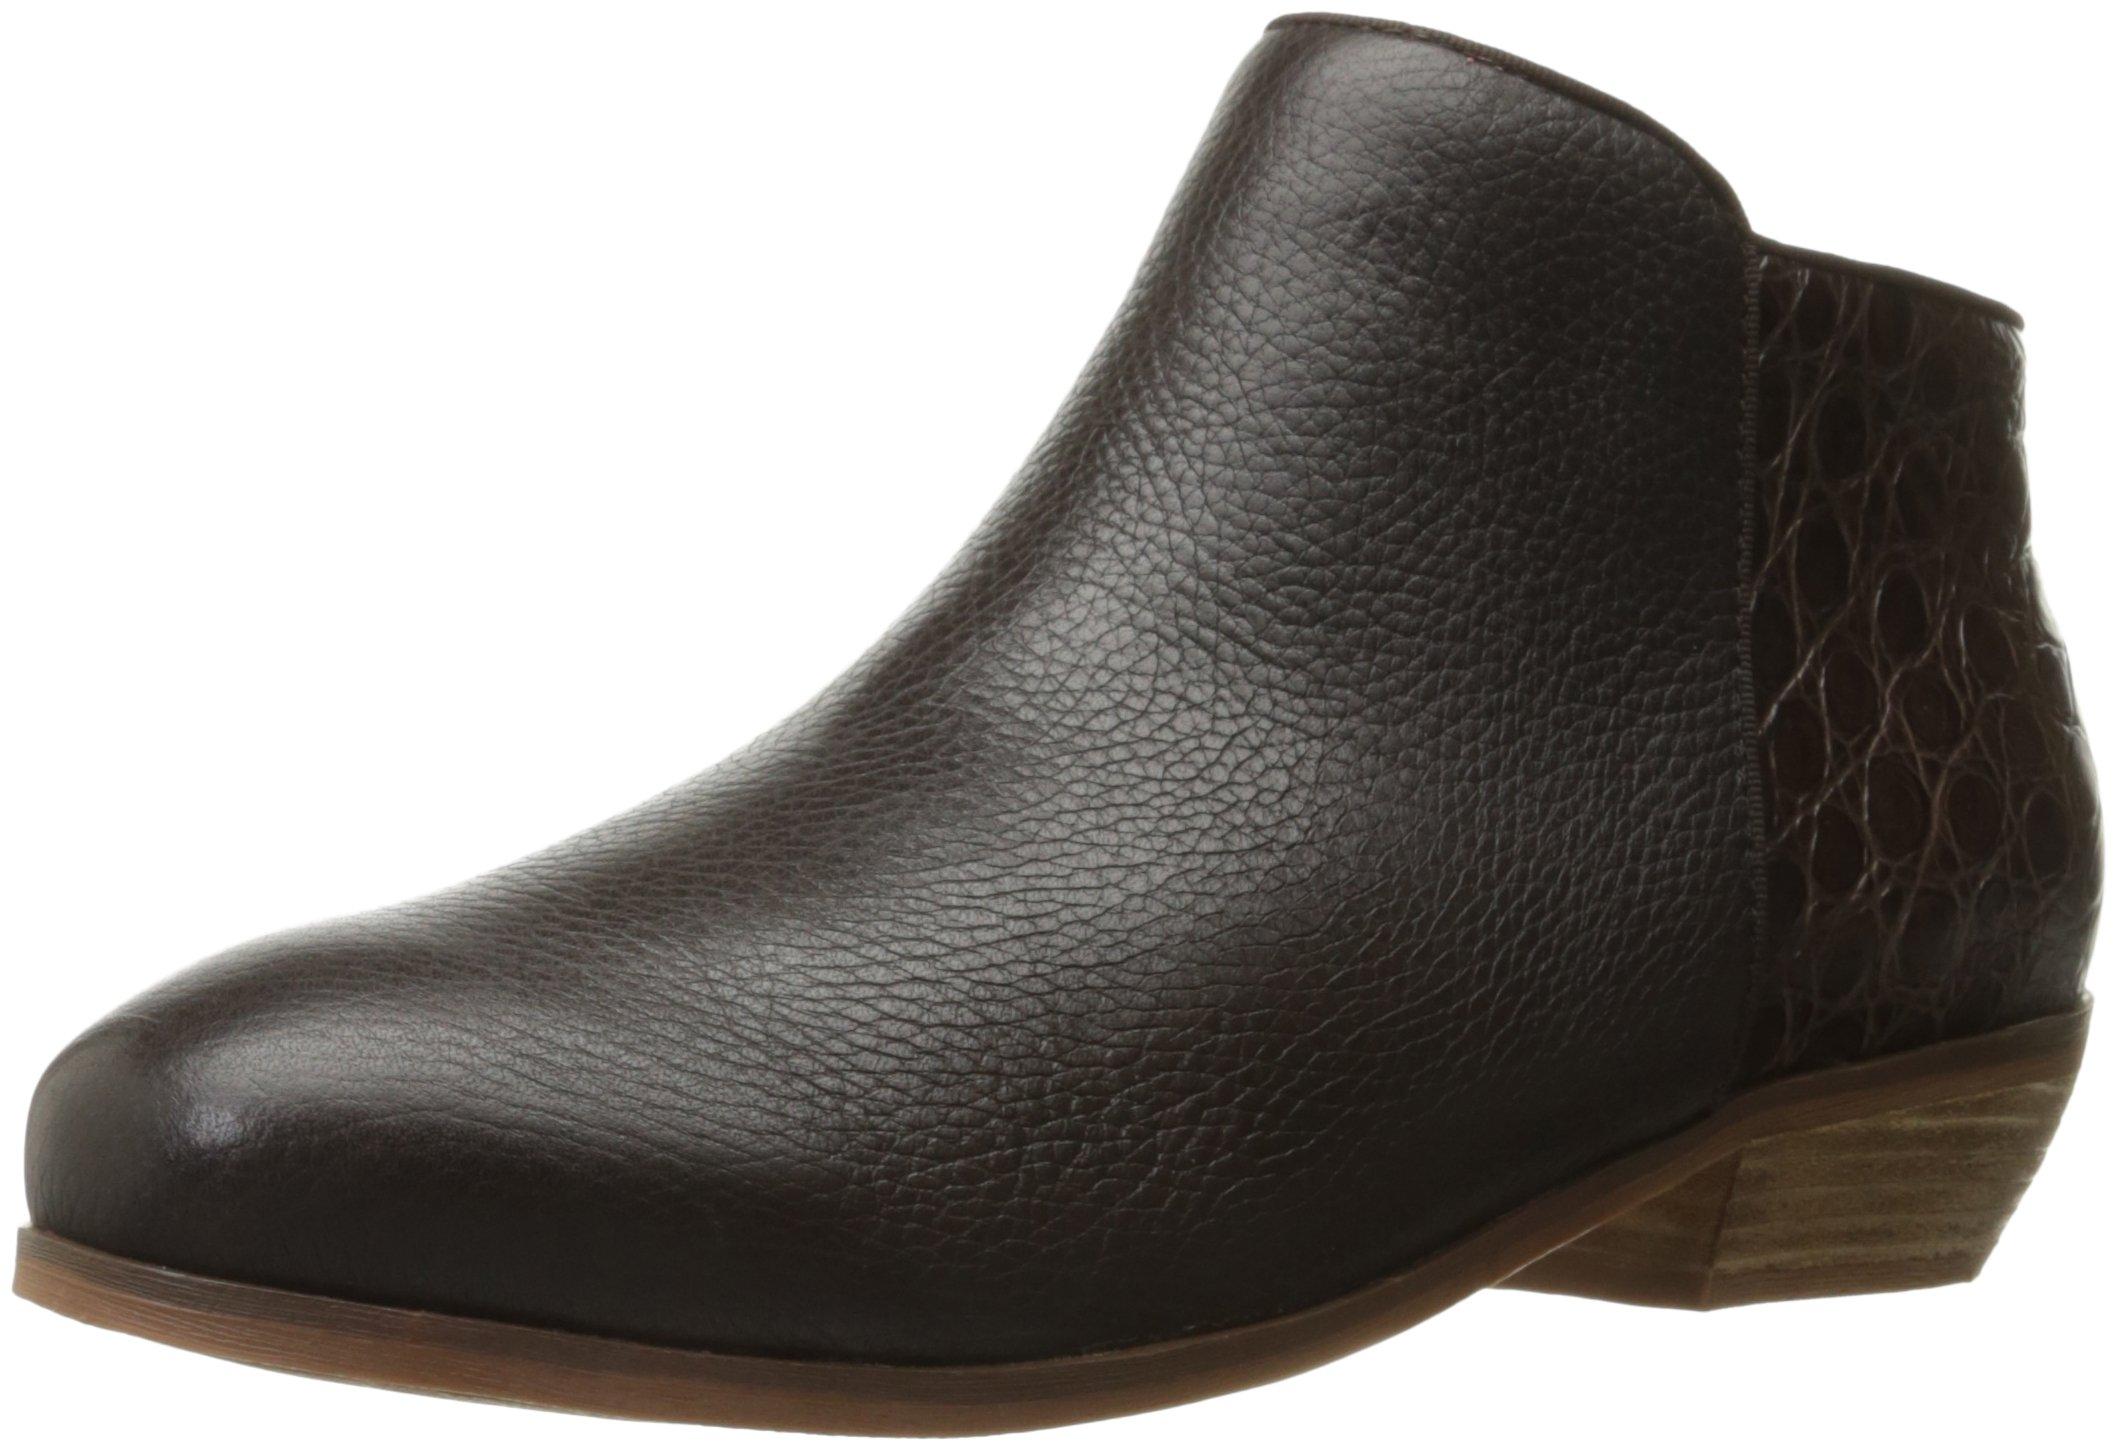 Softwalk Women's Rocklin Boot, Dark Brown Crocodile, 9.5 W US by SoftWalk (Image #1)